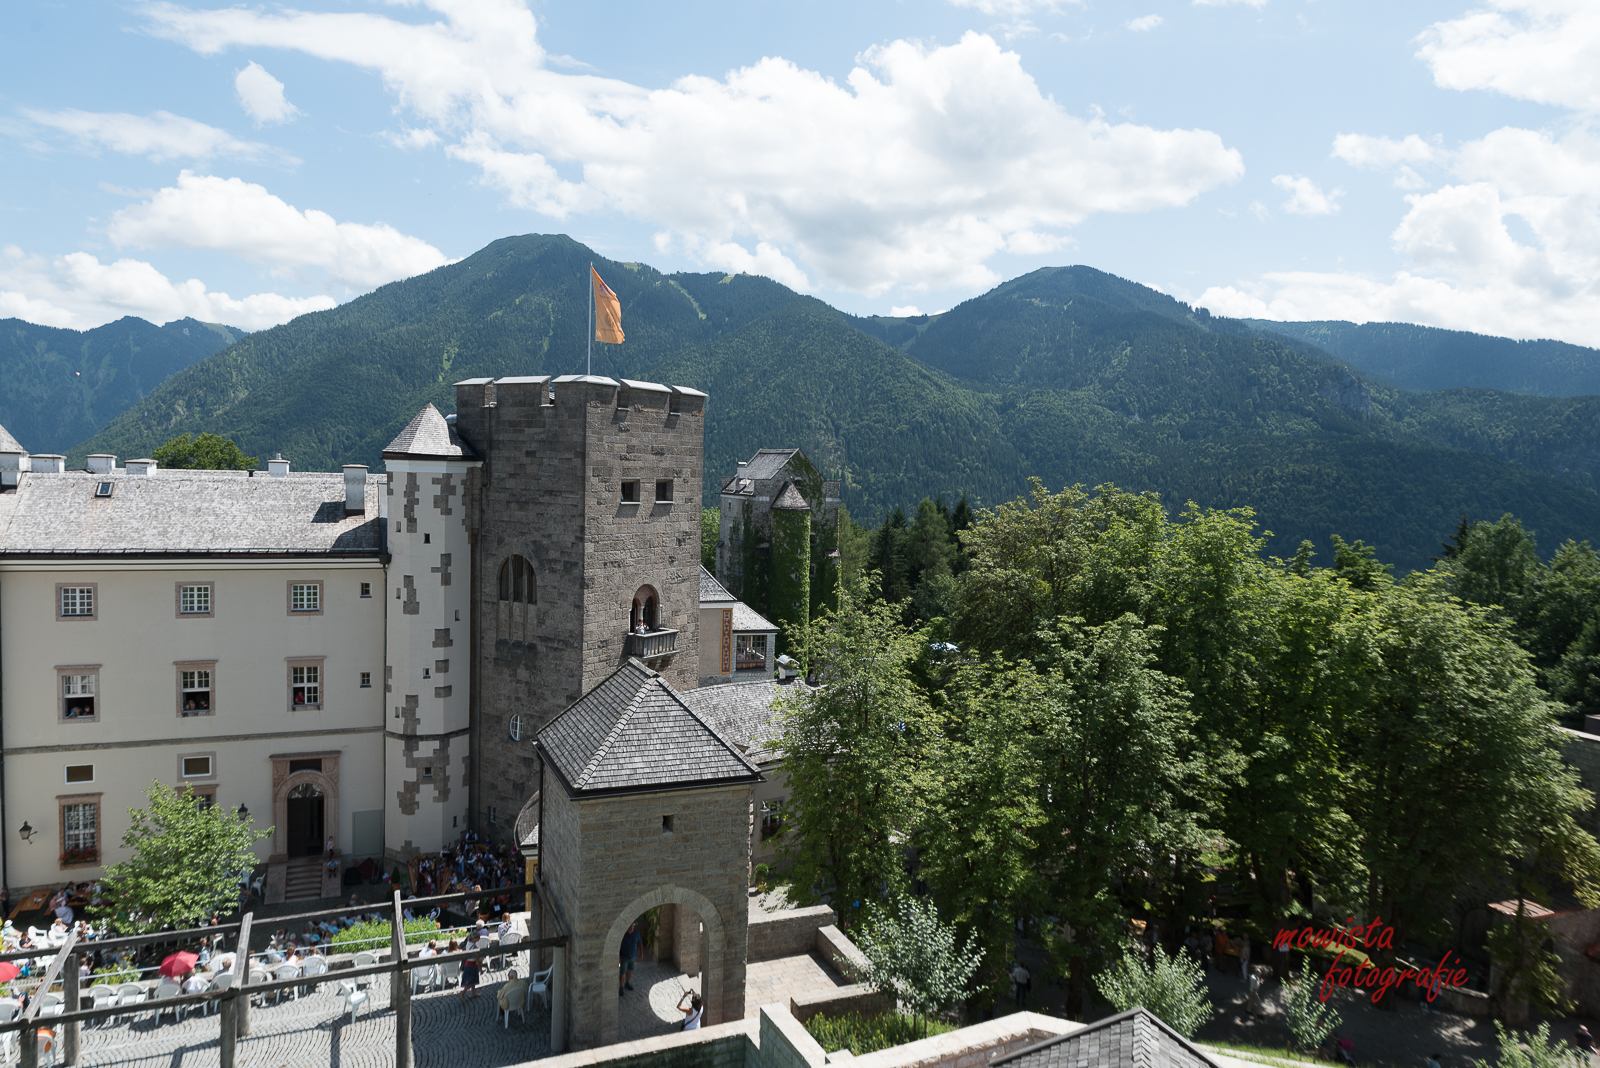 20170722_MW_DSC_5693_Schloss Ringberg